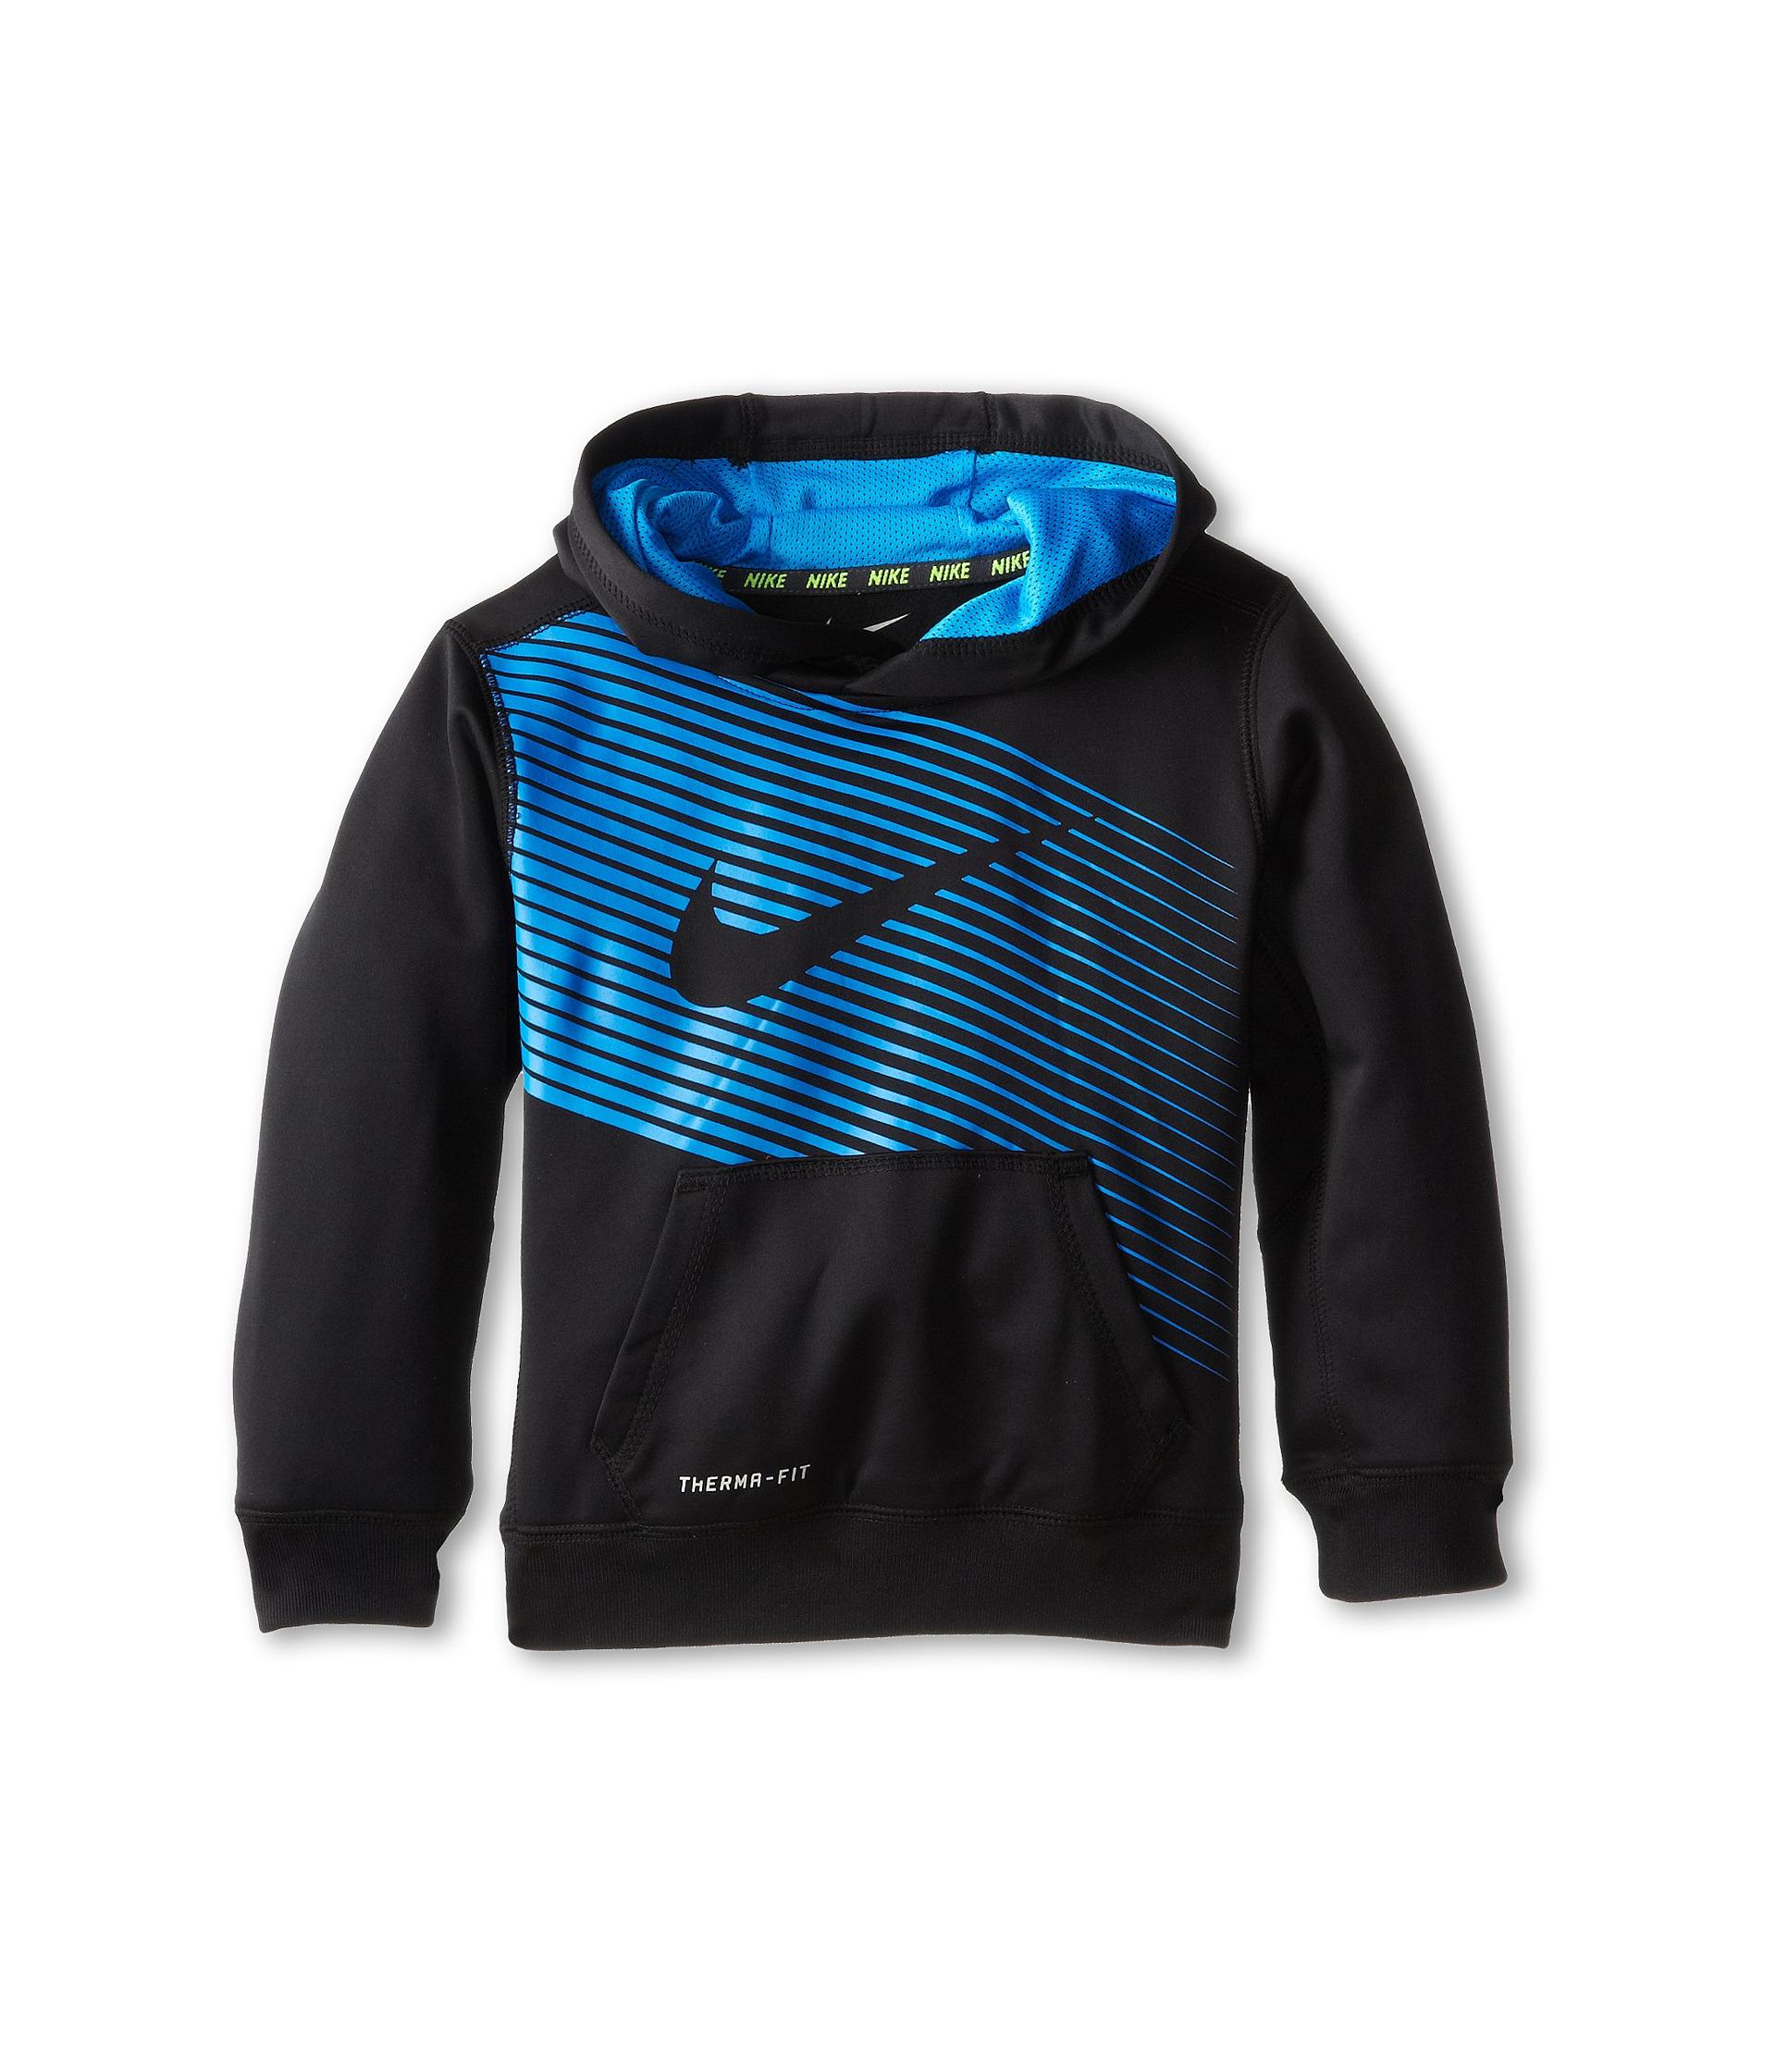 Nike Kids Ko Swoosh Gfx Hoodie Little Kids | Shipped Free ...